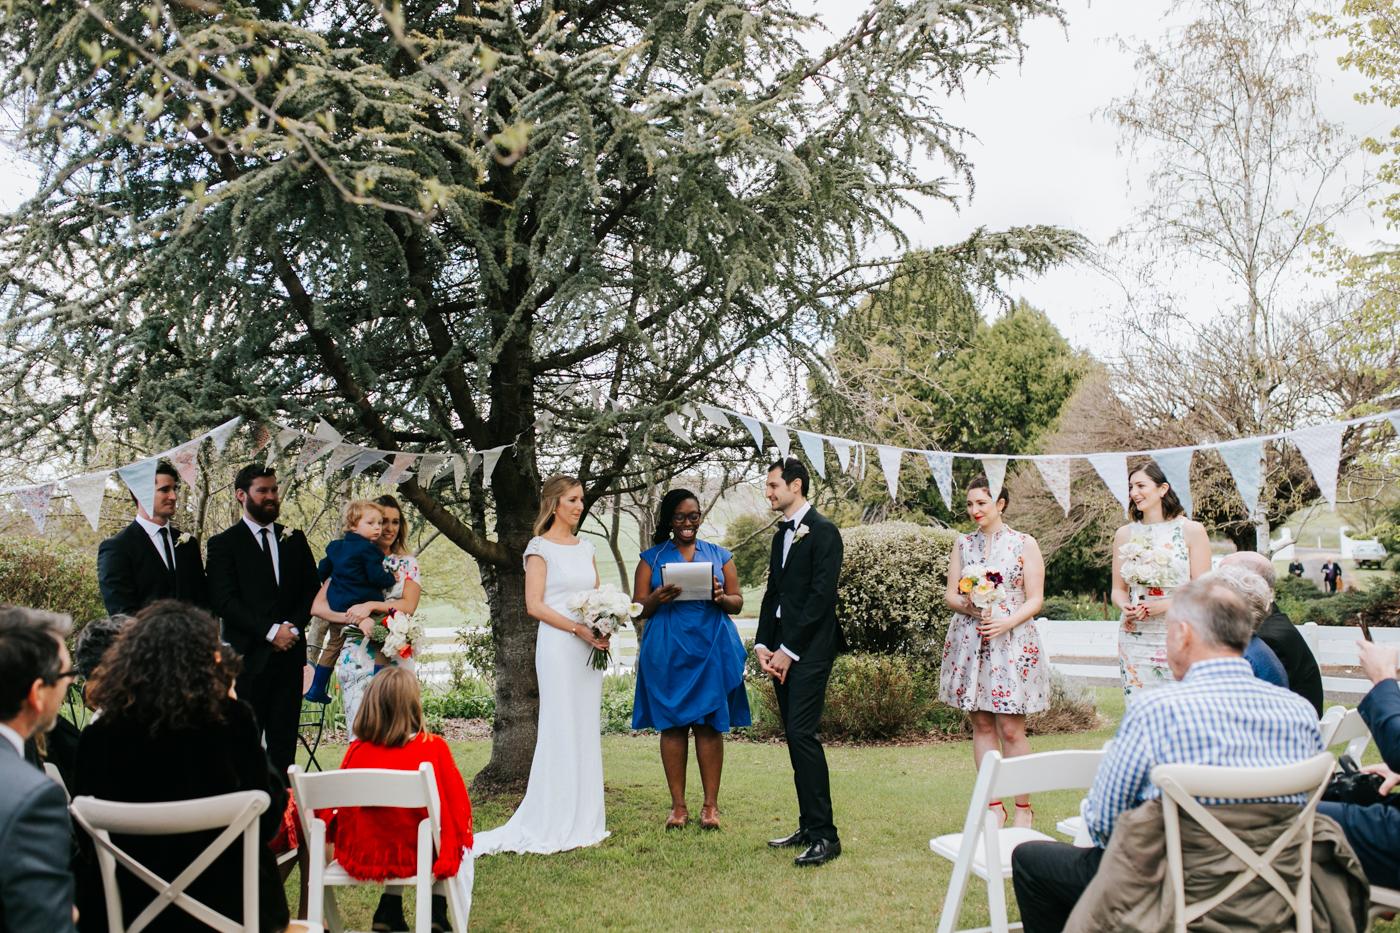 Bridget & James - Orange Country Wedding - Samantha Heather Photography-36.jpg